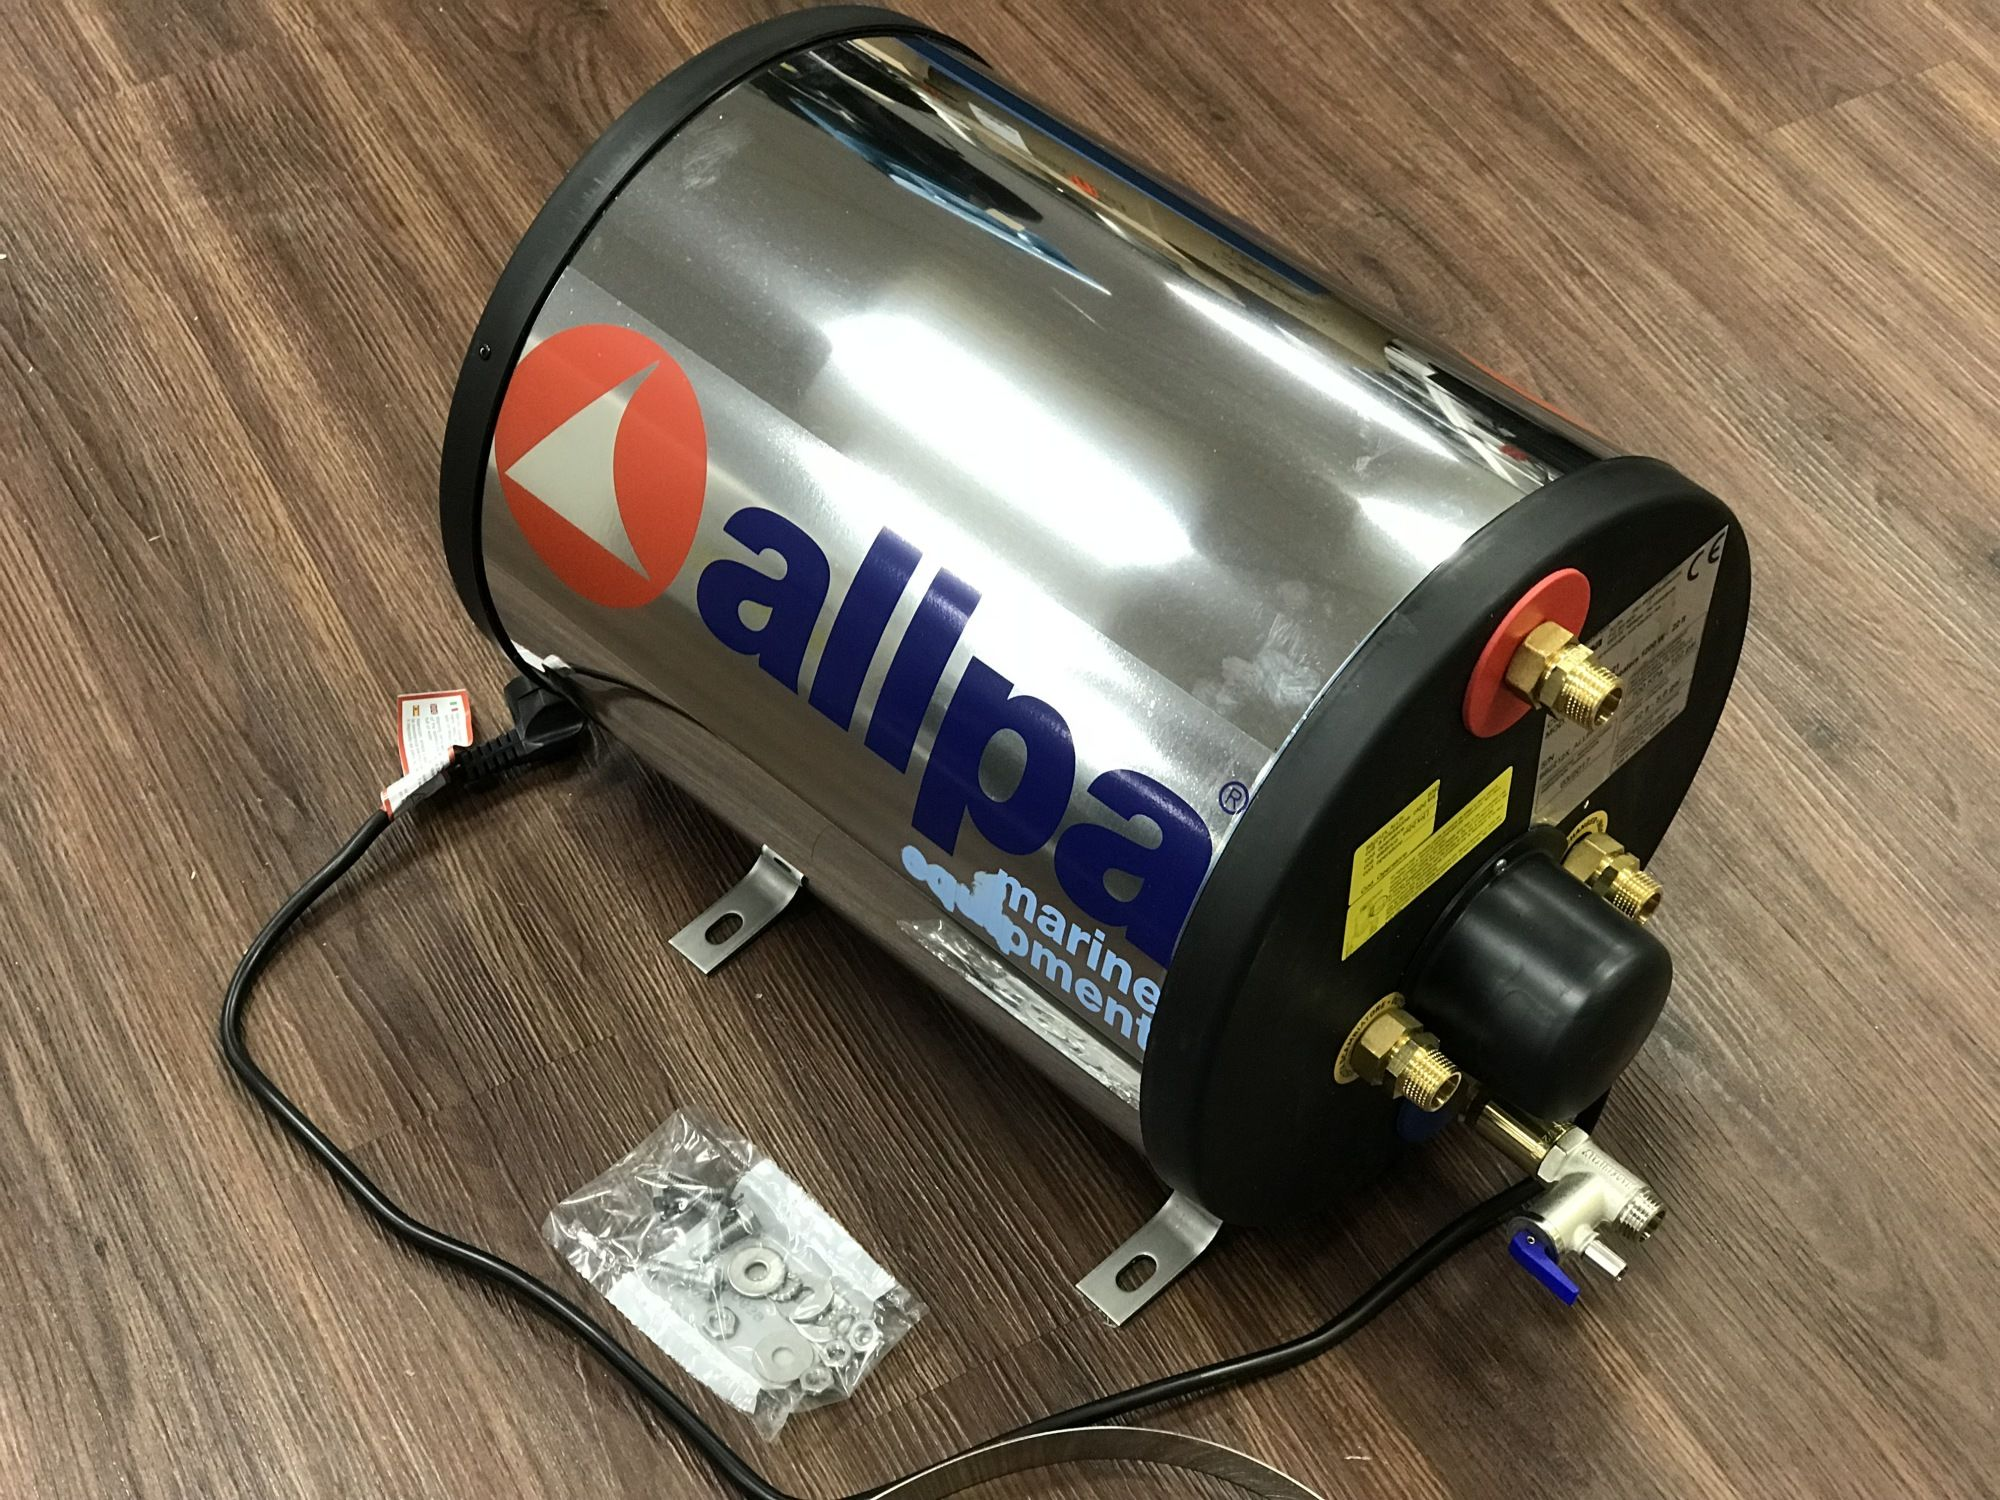 Allpa VA Heißwasserboiler 22 Liter Motorwärme und Heizspirale 230V 800 Watt